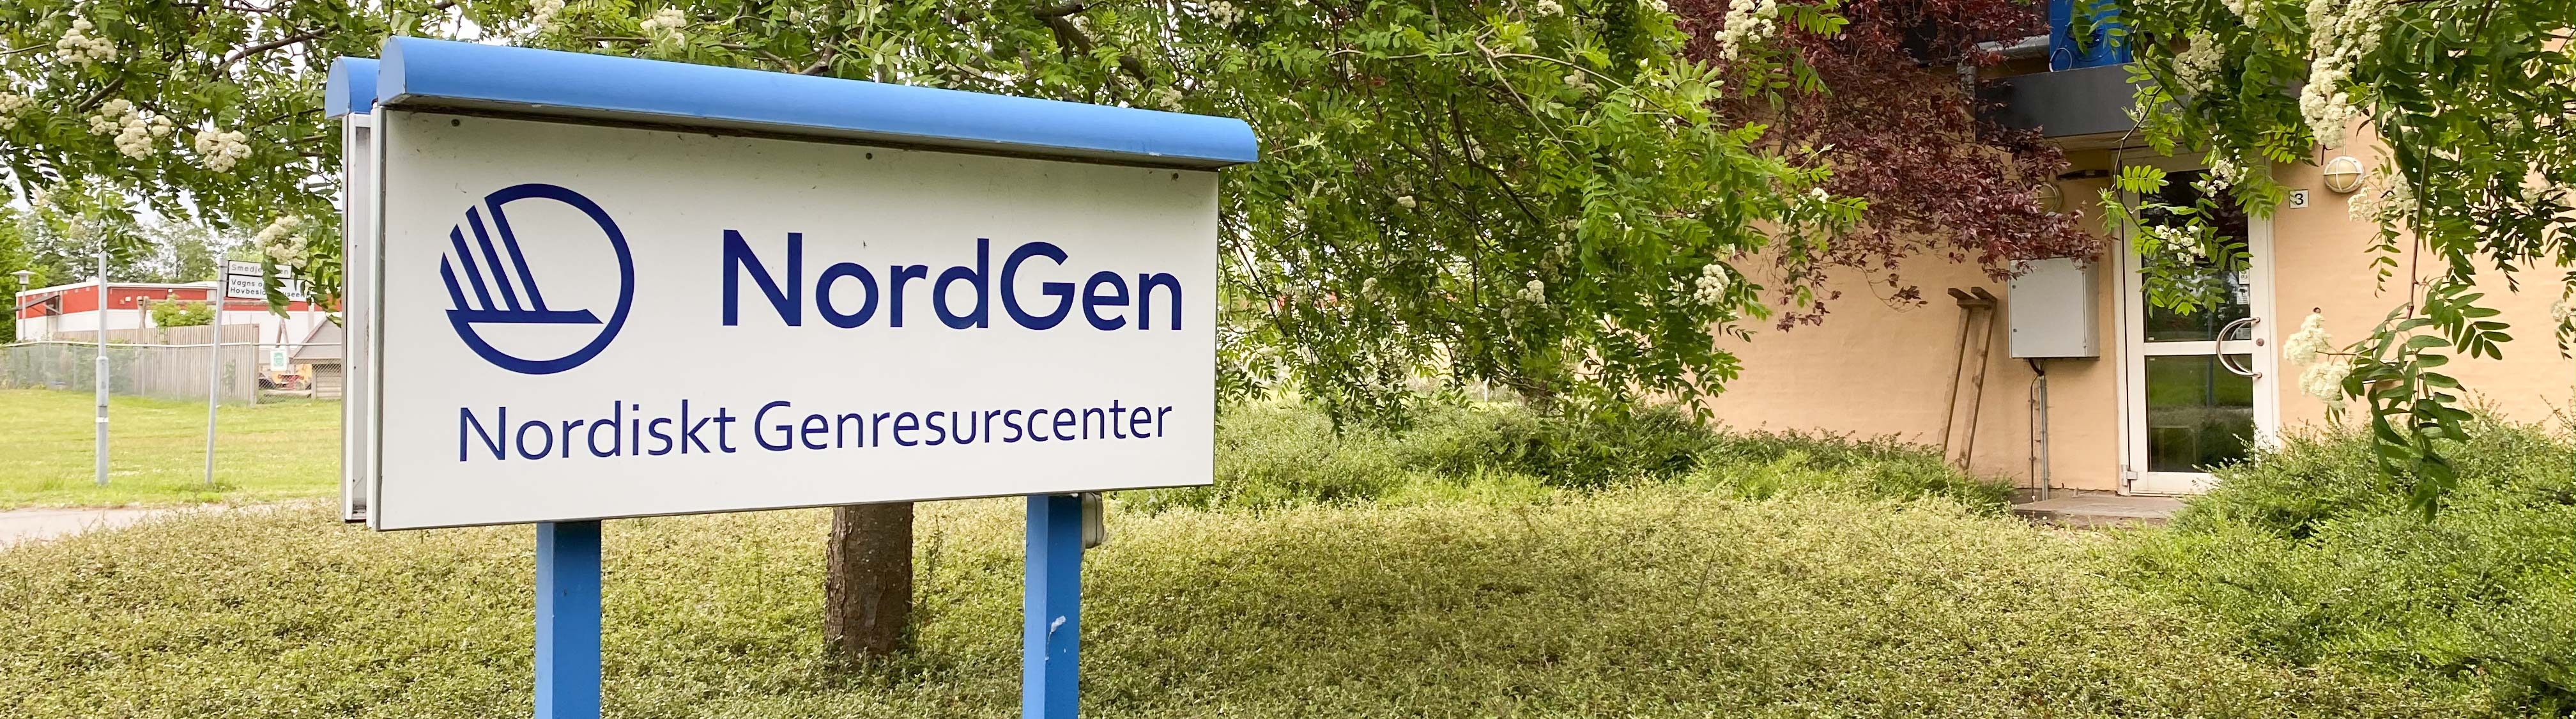 NordGen-sign in blue and white outside of Nordgen's head office.